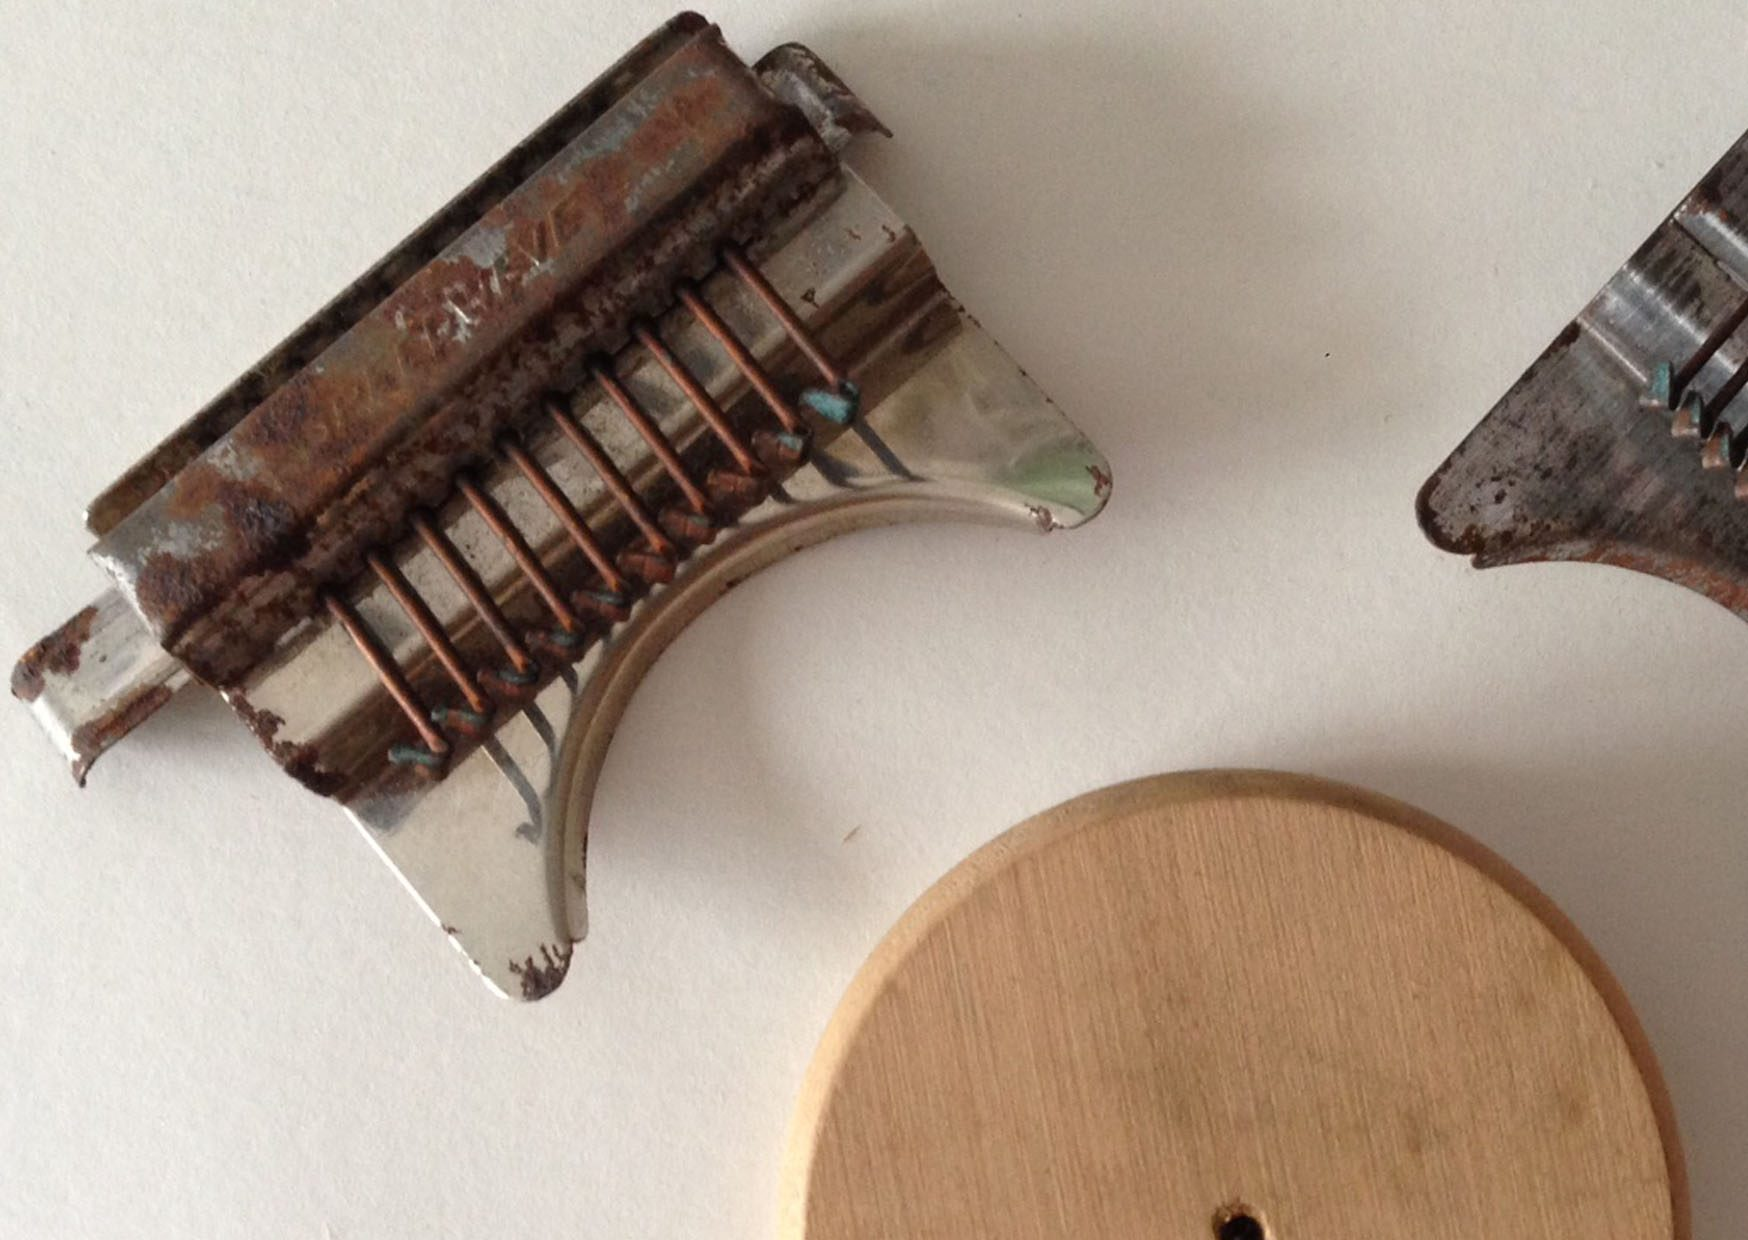 CCABridget Harvey, Speedweve Mending Tool, 2014